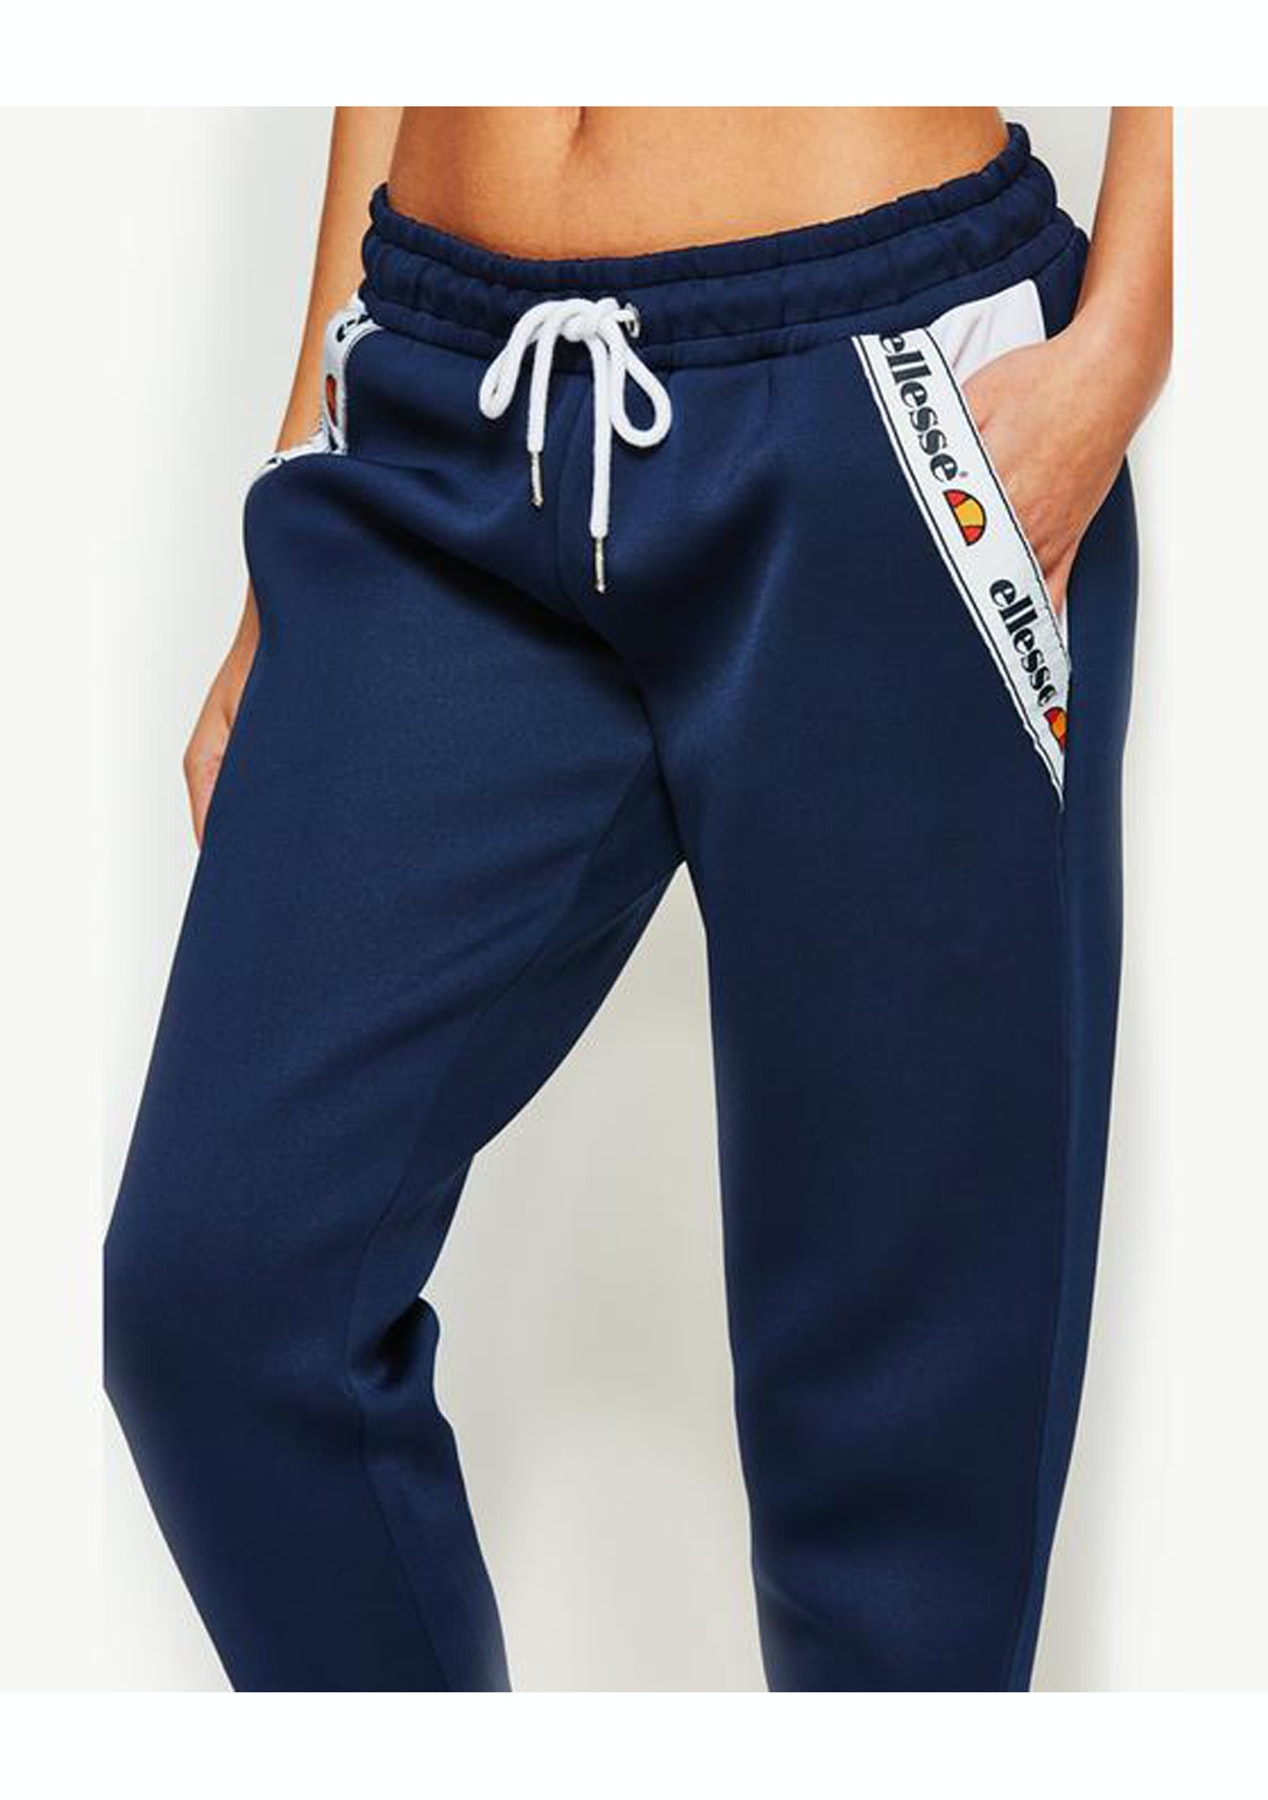 16658f54 Ellesse - Womens - Scapita Track Pant Navy - Navy - Streetwear Sale - Onceit